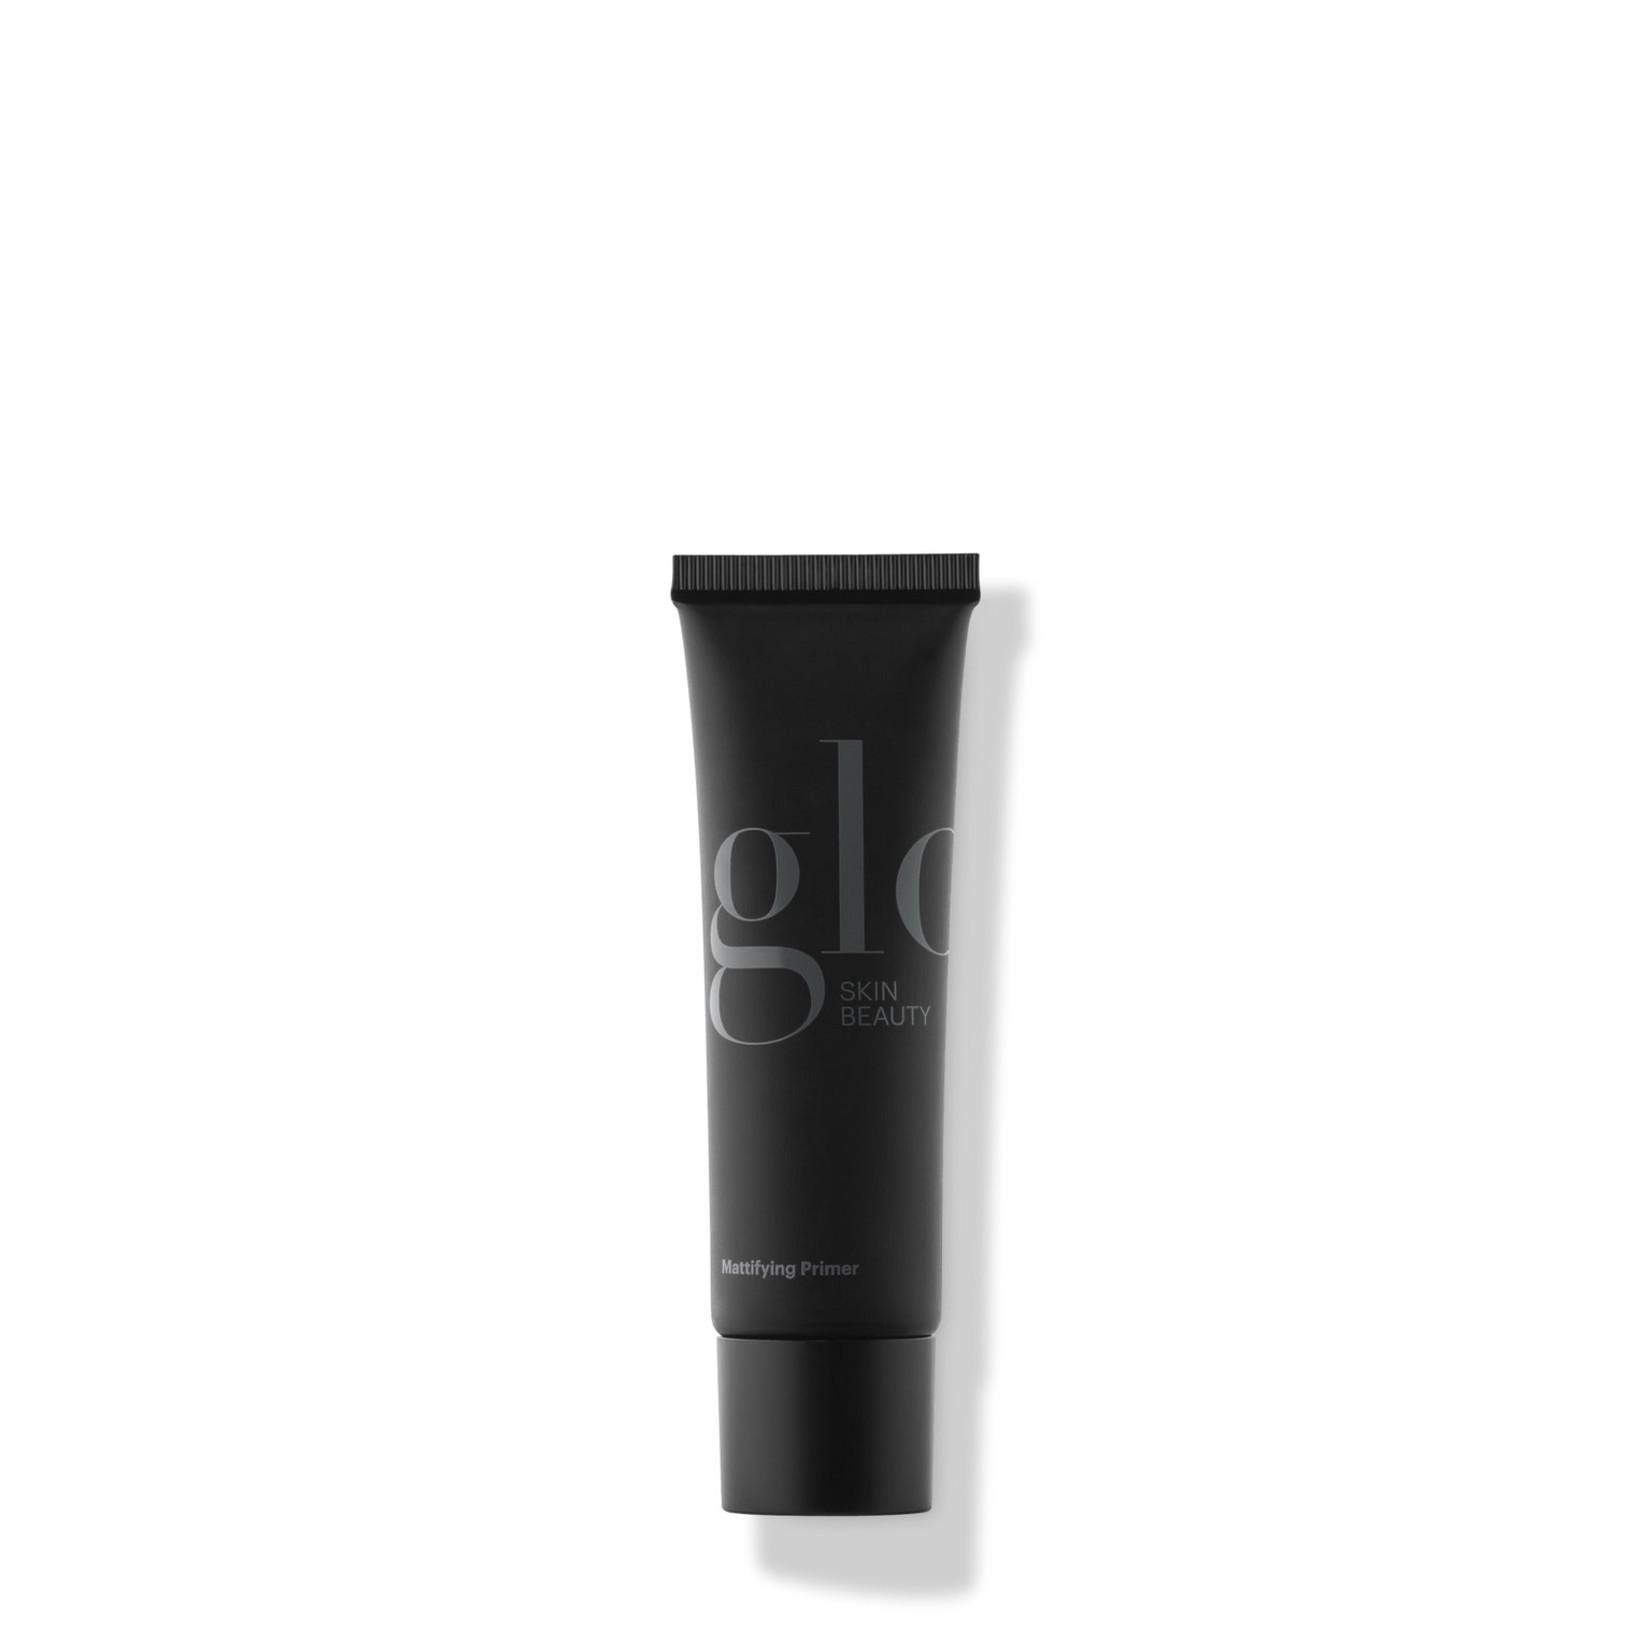 Glo Skin Beauty Mattifying Primer